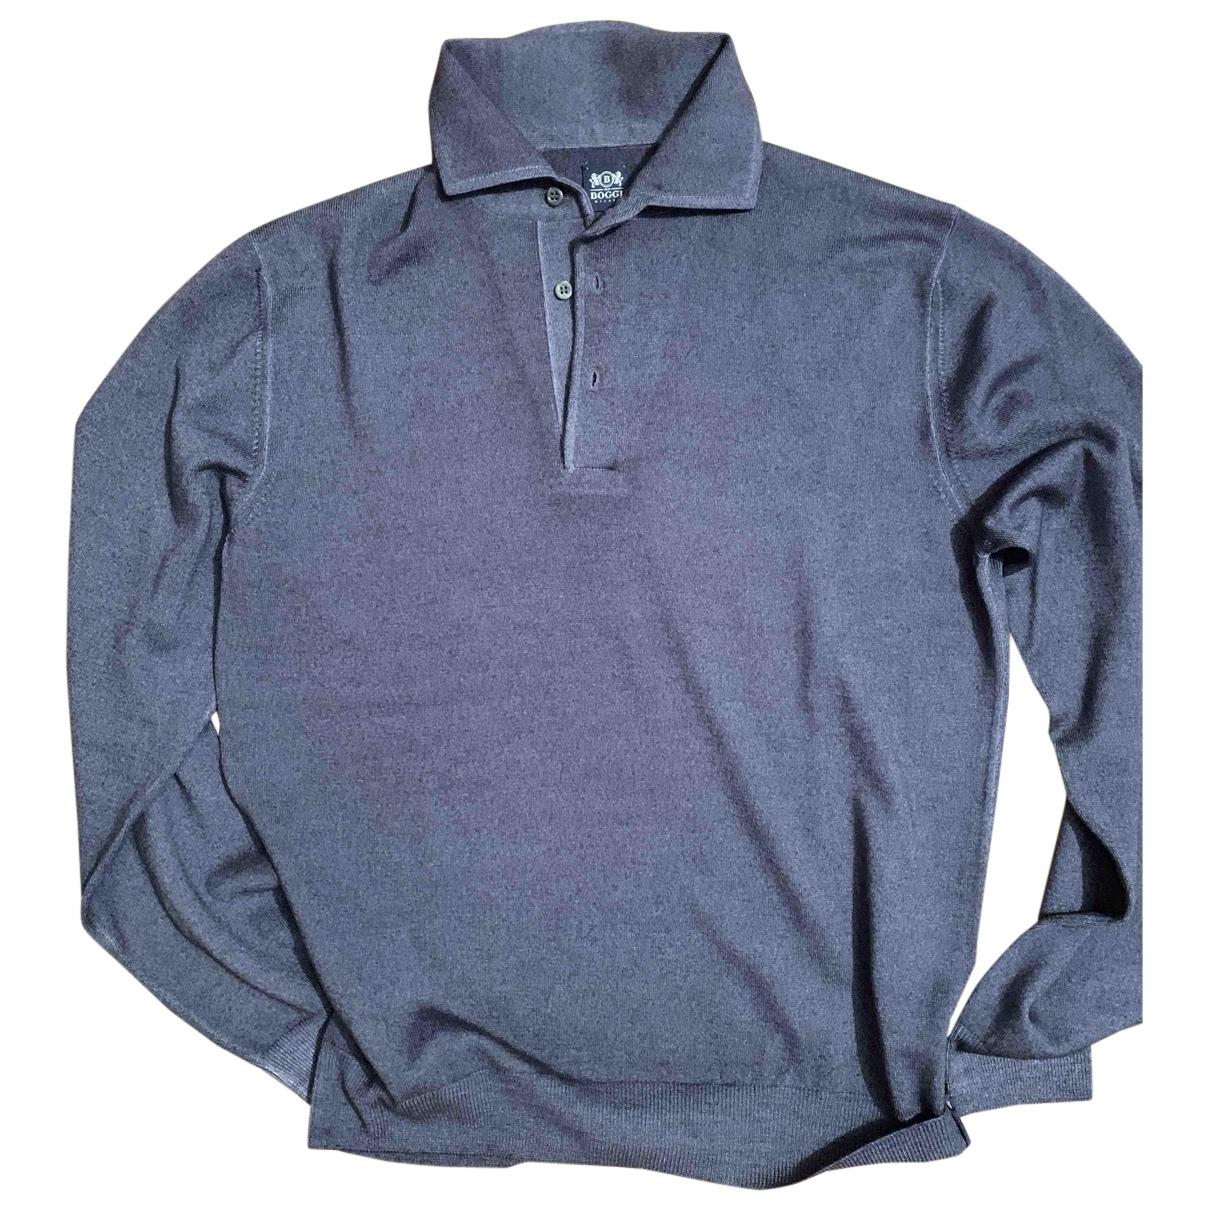 Boggi N Anthracite Wool Knitwear & Sweatshirts for Men M International